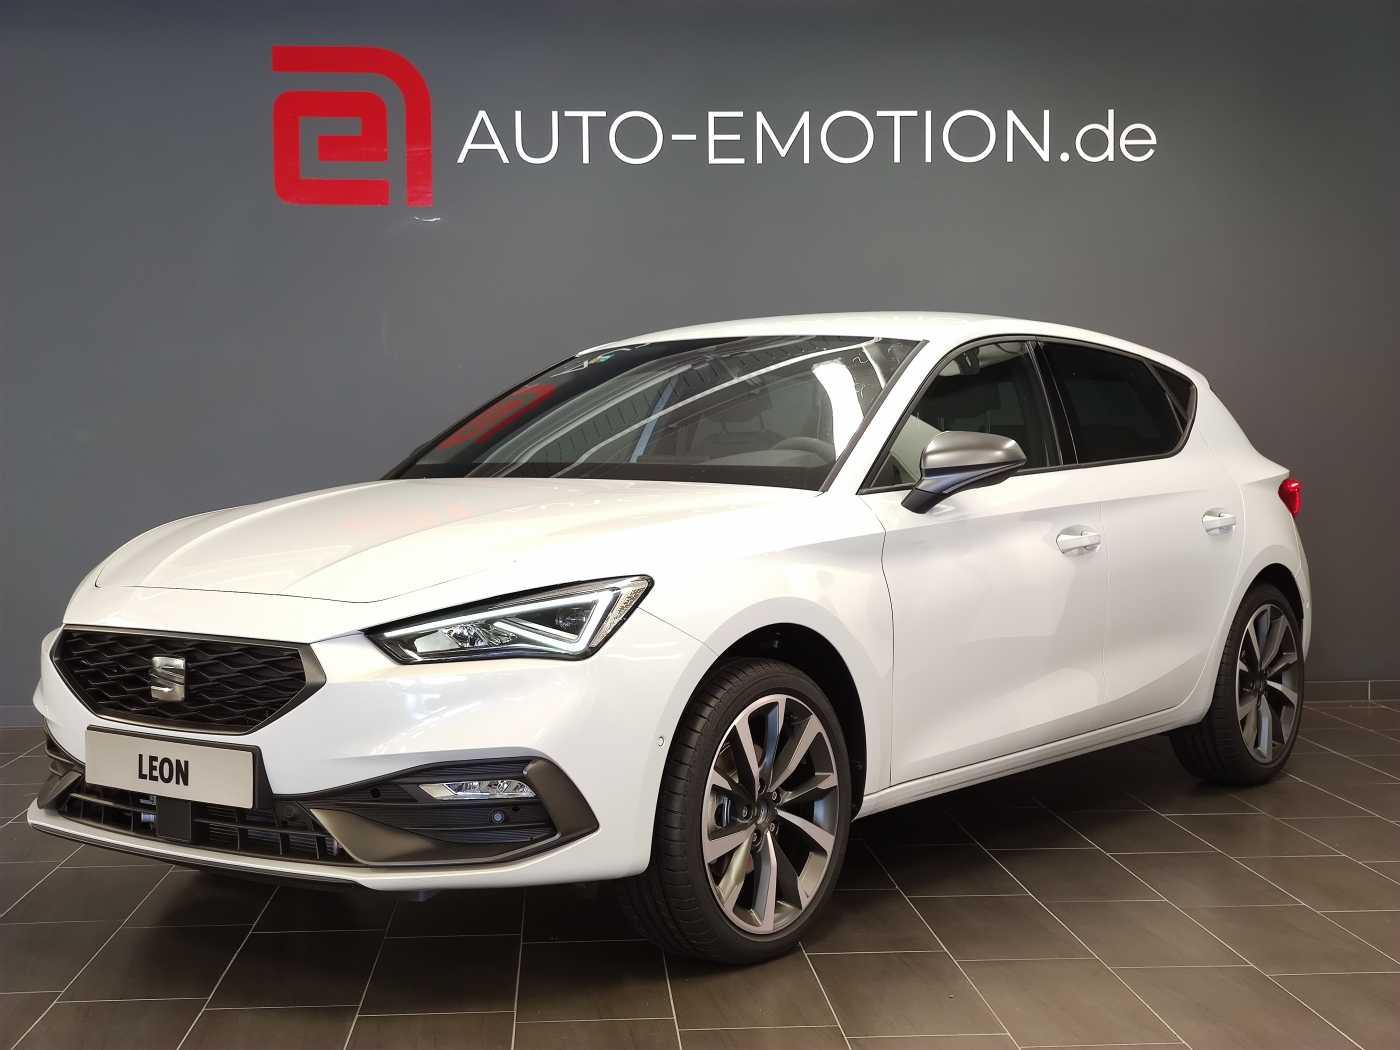 Seat Leon FR 1.5 eTSI ACT 110 kW (150 PS) 7-Gang-DSG, Jahr 2020, Benzin